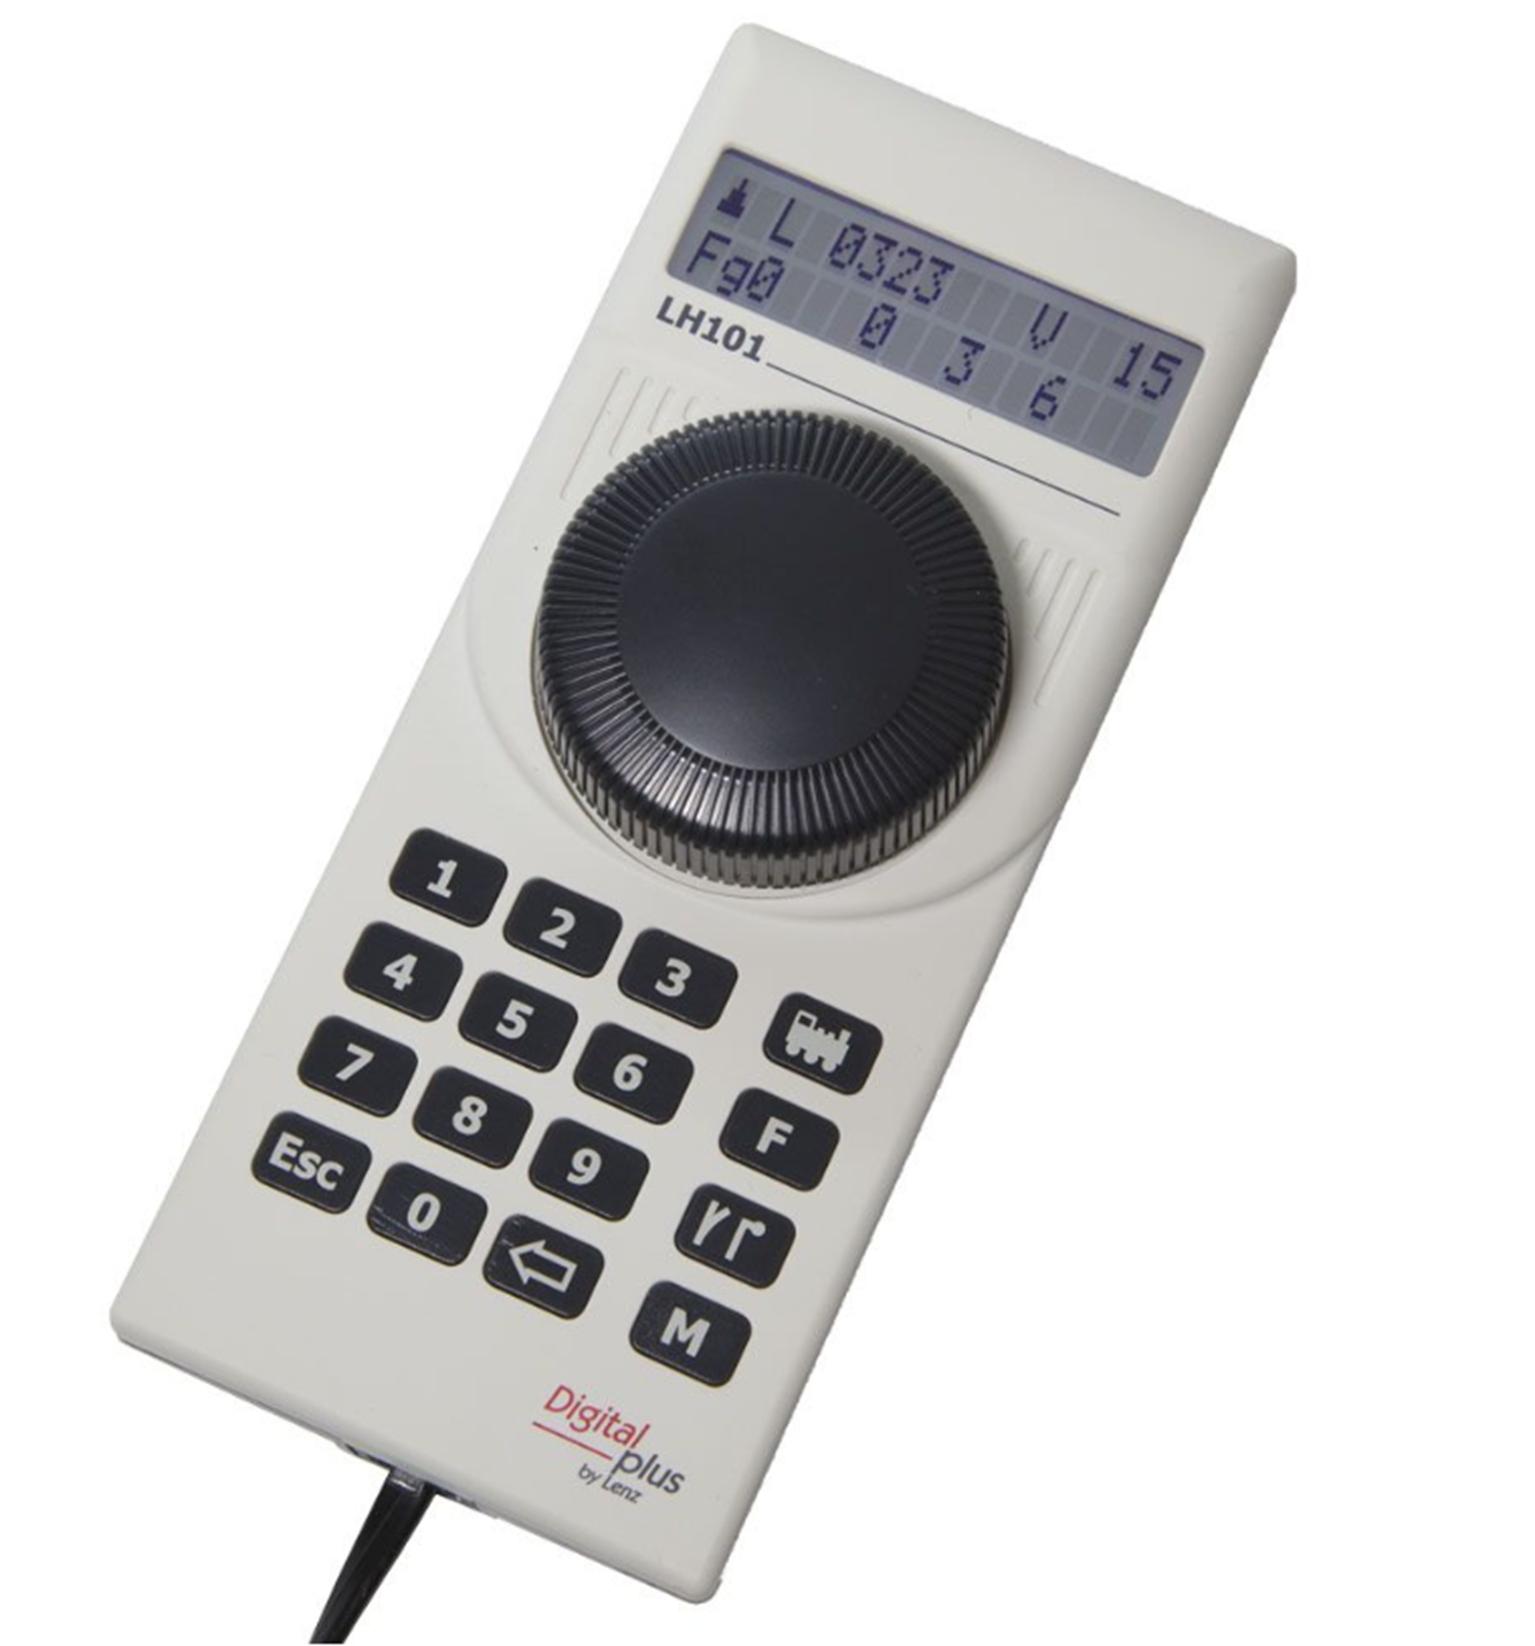 LH101 Hand controller